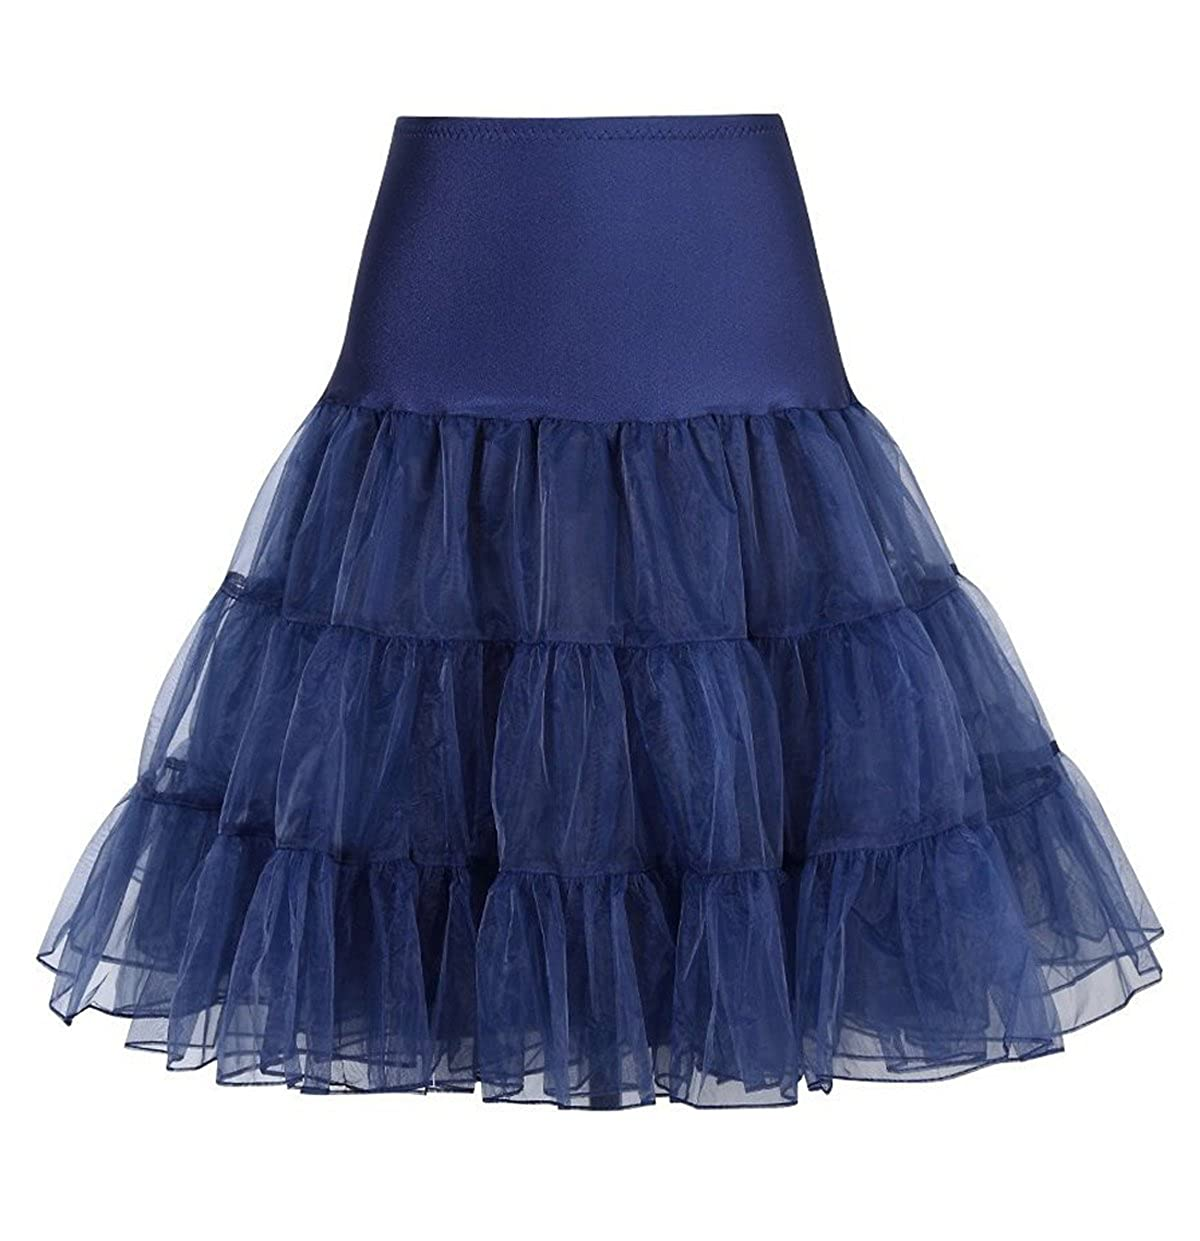 Laorchid Womens 50s Petticoat Knee-Length Crinoline Underskirts Tutu Slip